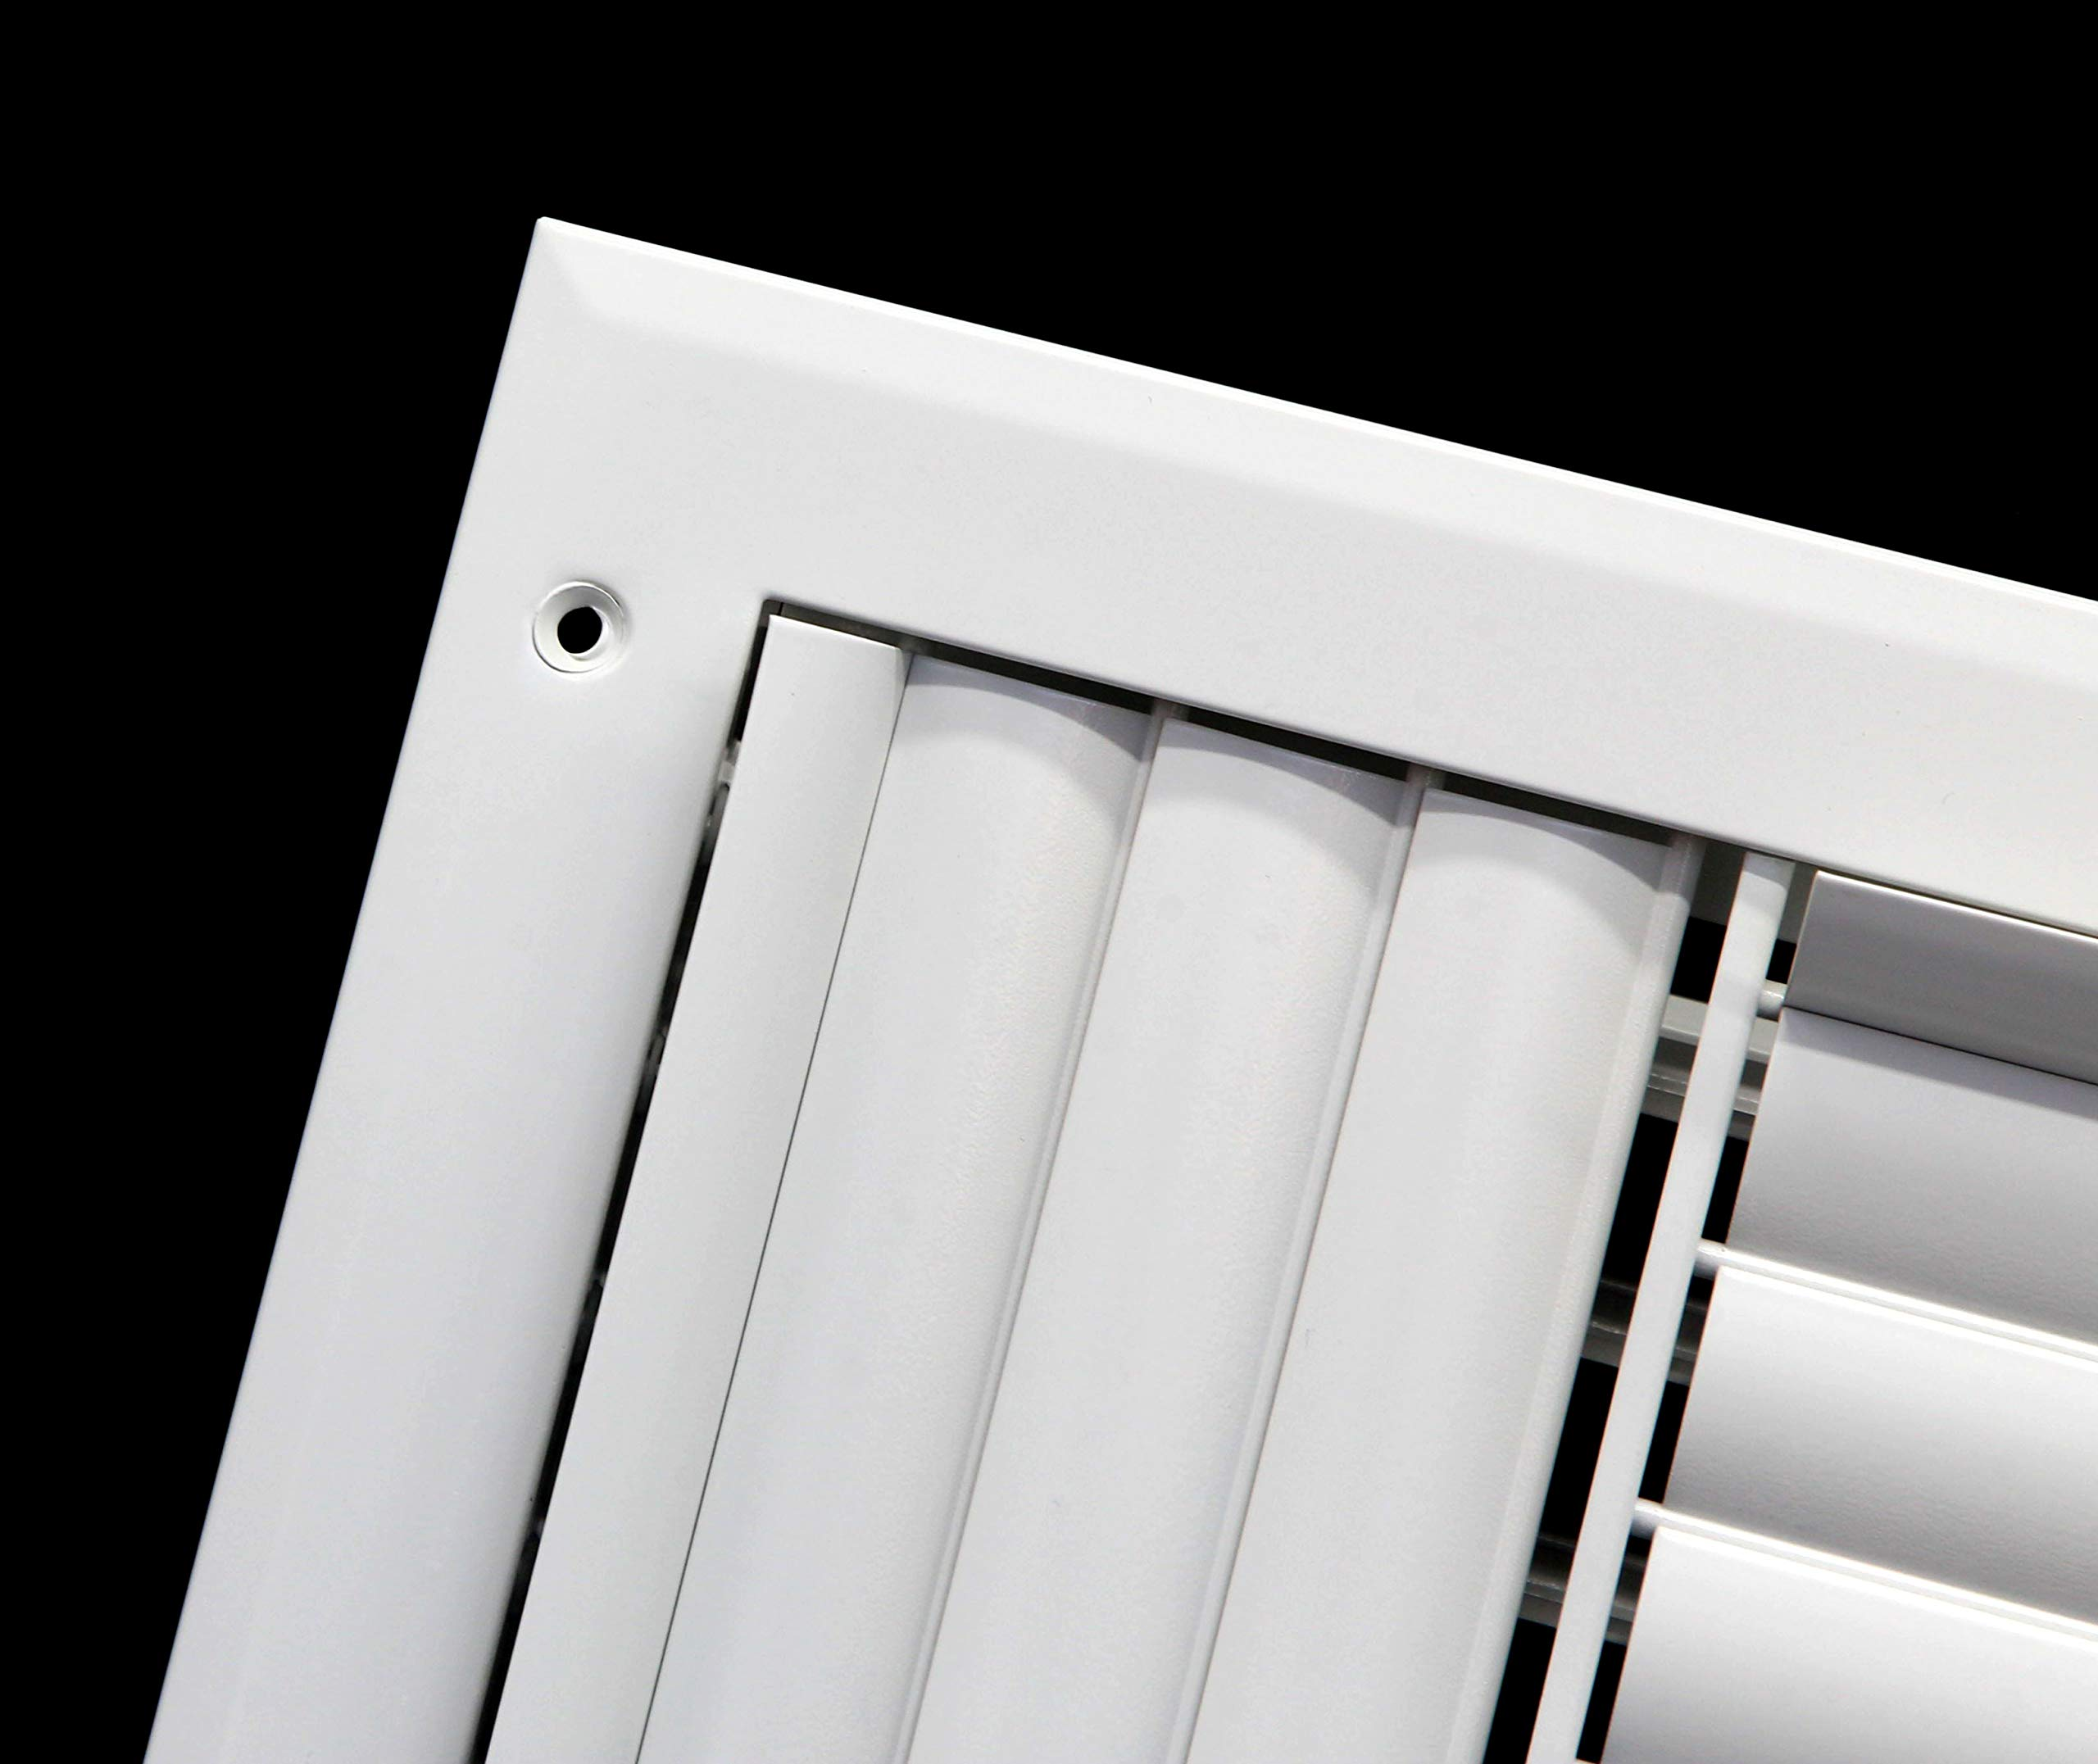 HVAC Grille Maximum Air Flow Adjustable Aluminum Curved Blades 12 x 4-1-Way Air Vent